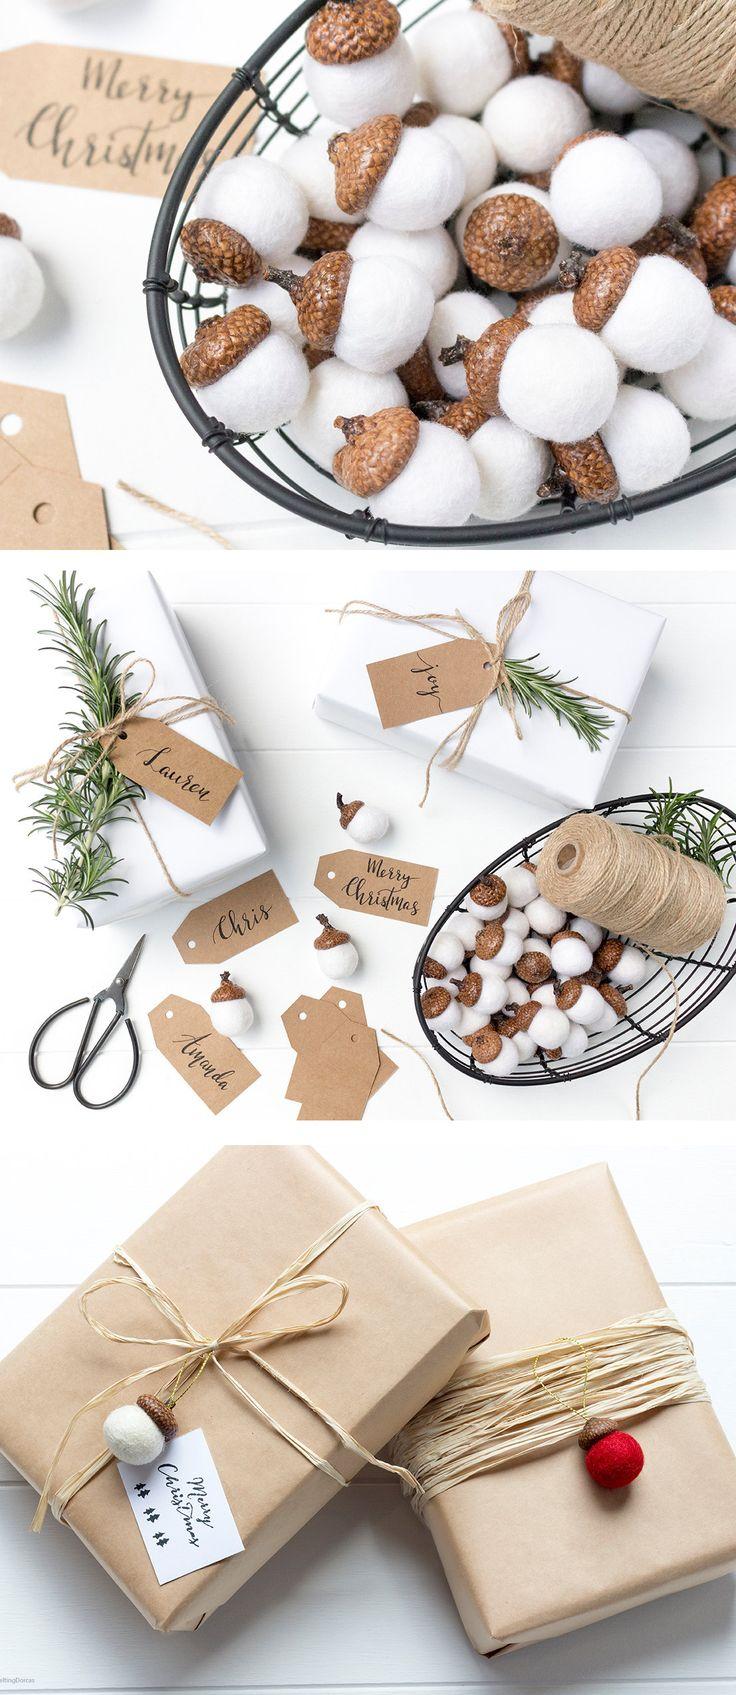 Felted Acorns. Felt Ball Acorn Ornaments. Christmas ornaments. Pom Pom. Wool Felt Ball. Christmas decorations. Gift wrap. Acorns.